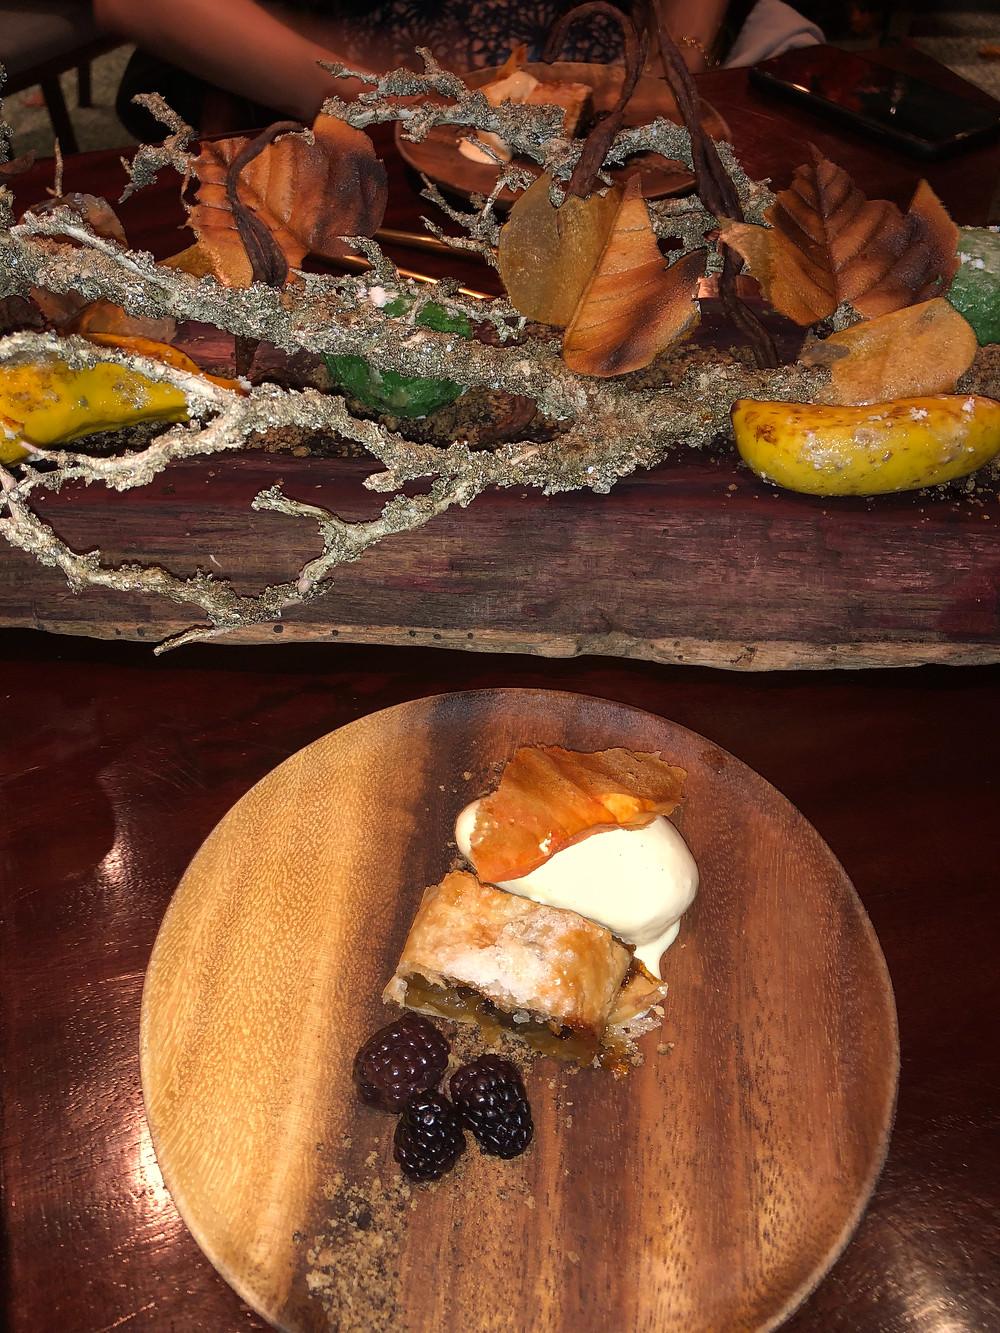 Restaurant Uwe | Uwe Opocensky | Apple Strudel